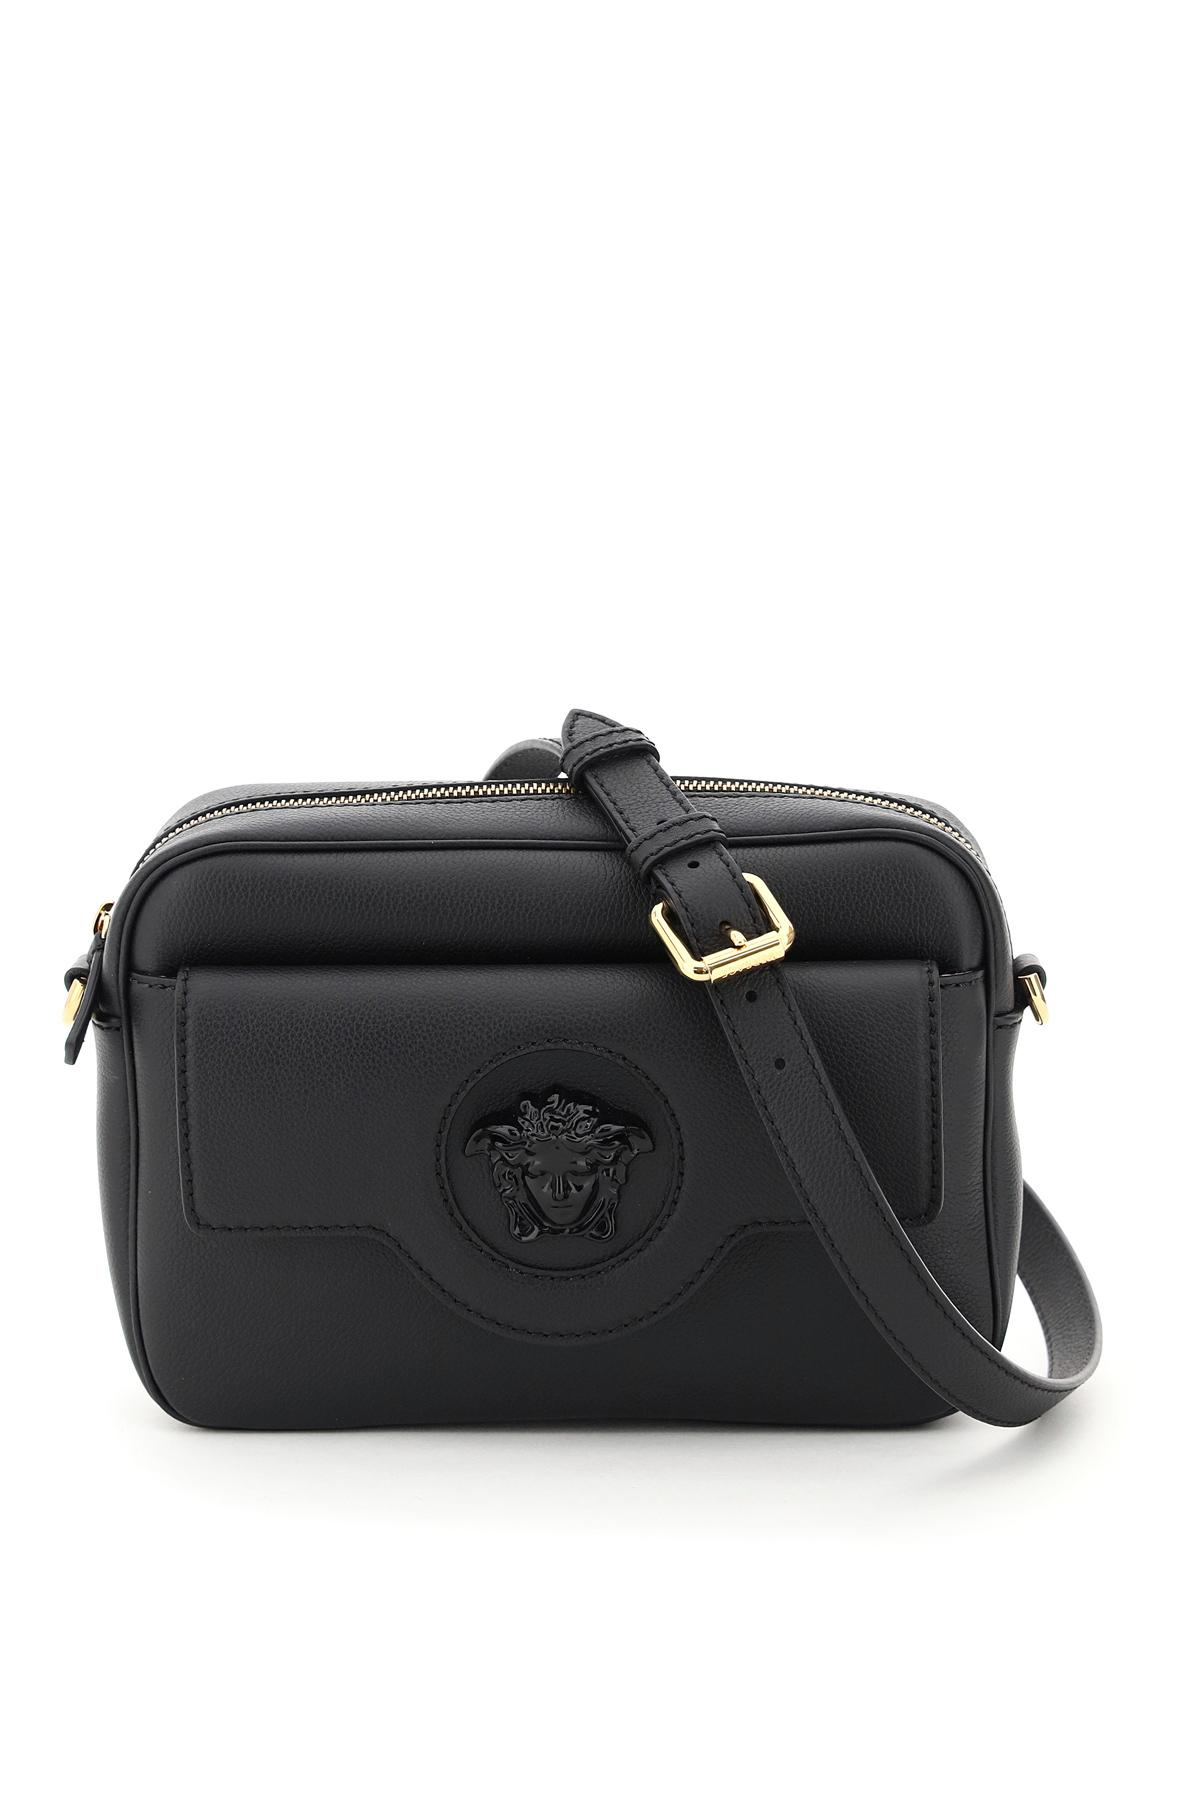 VERSACE LA MEDUSA CAMERA BAG OS Black Leather